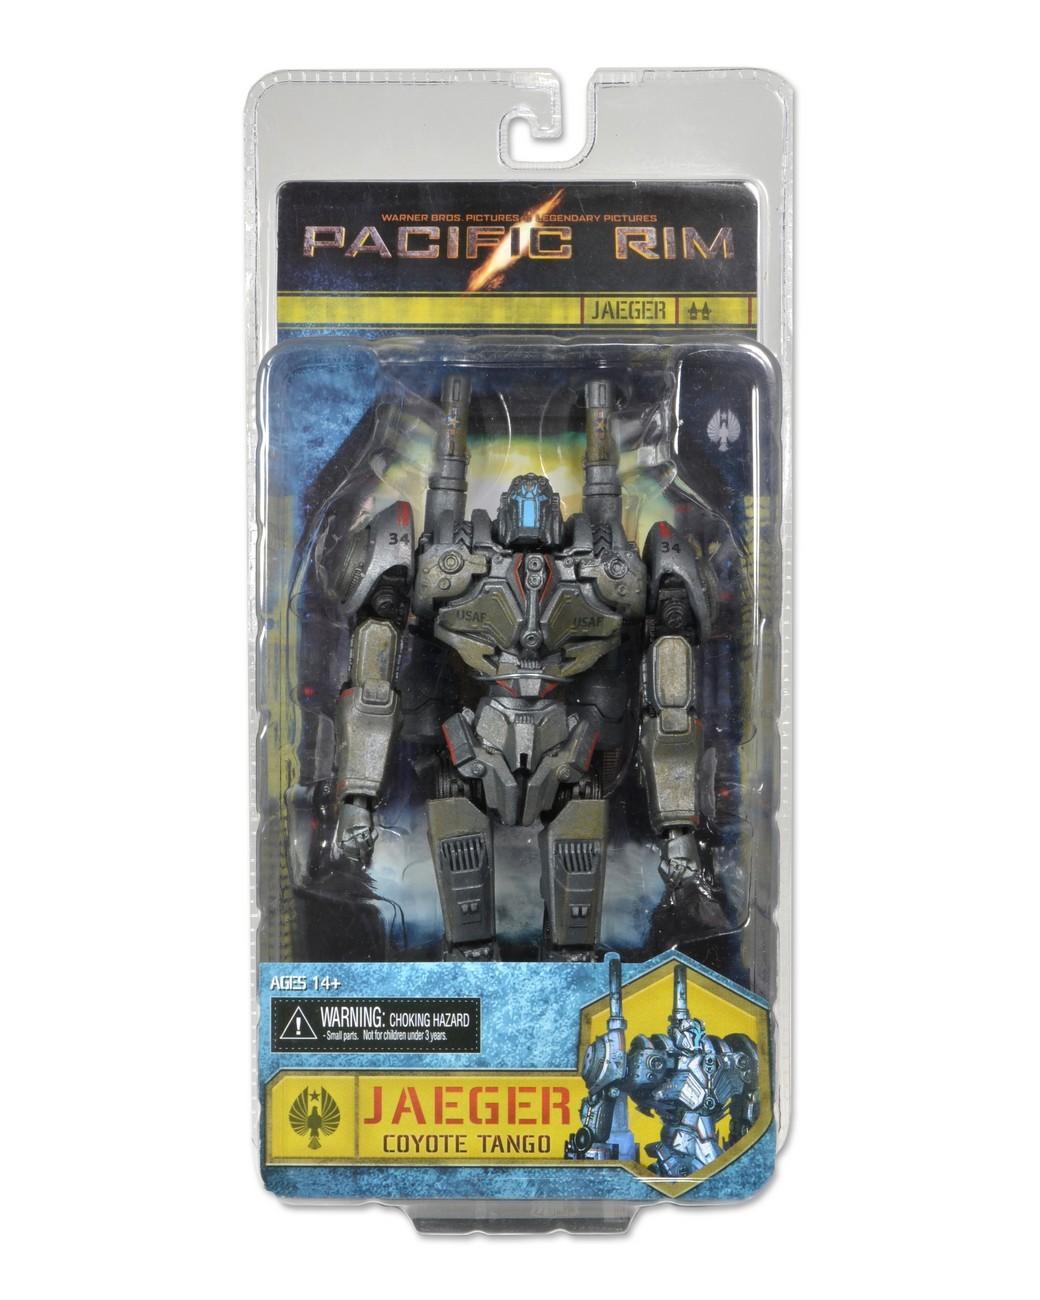 NECA Pacific Rim – Series 3 Japanese Jaeger Coyote Tango